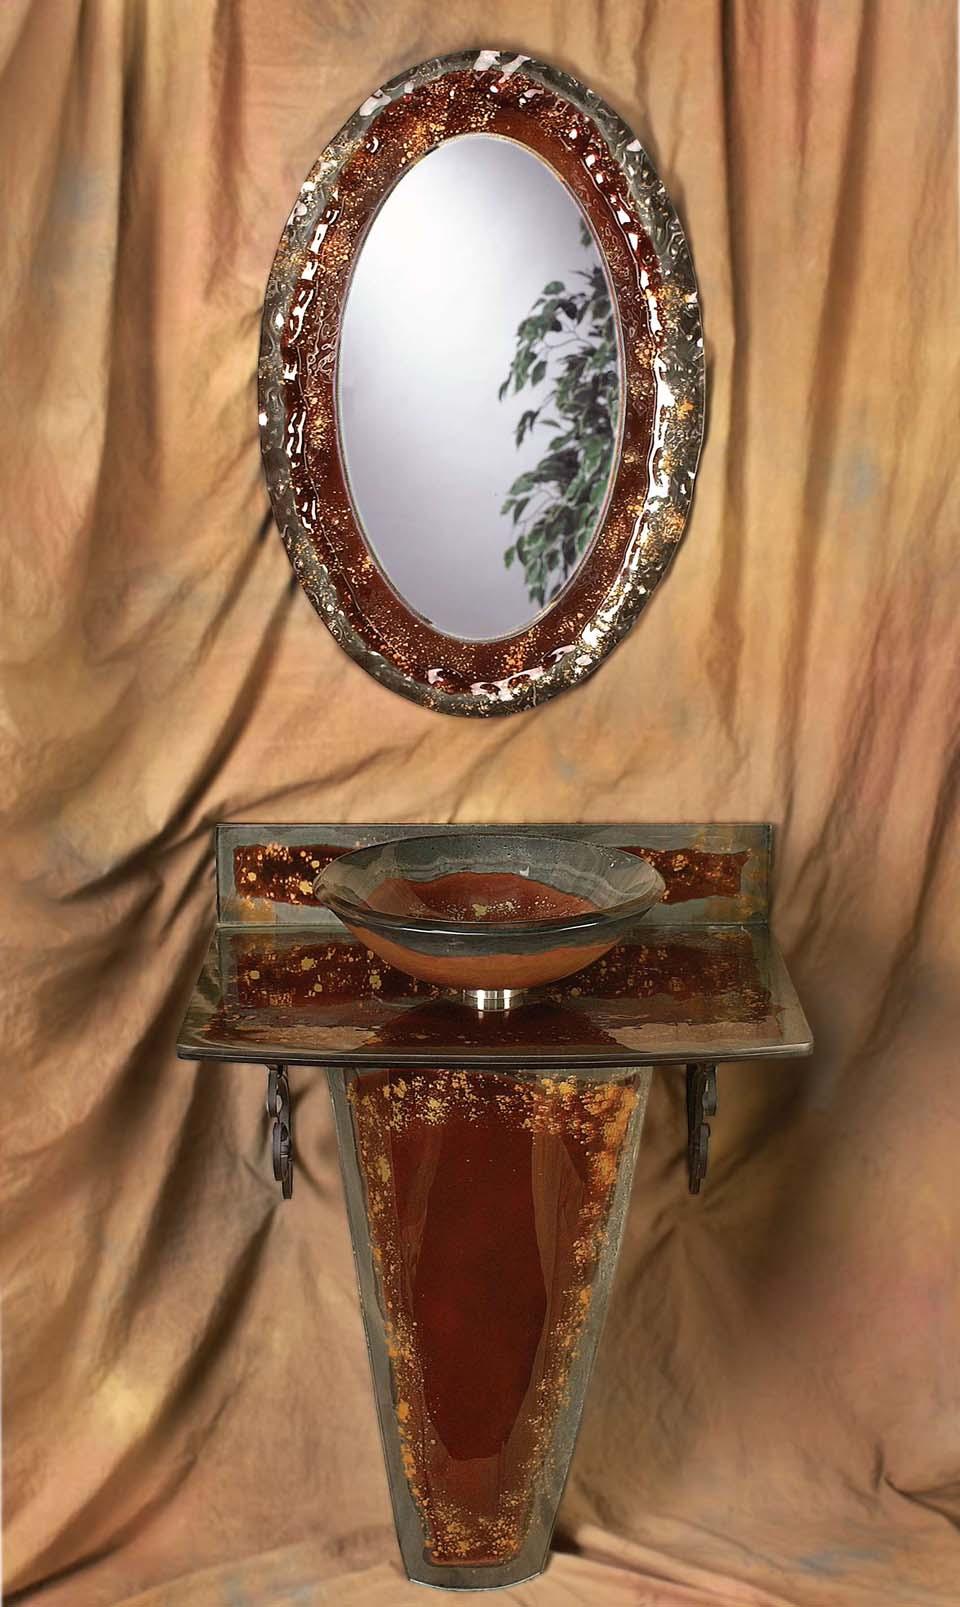 Picture of Copper Storm Vignette Bathroom Pedestal